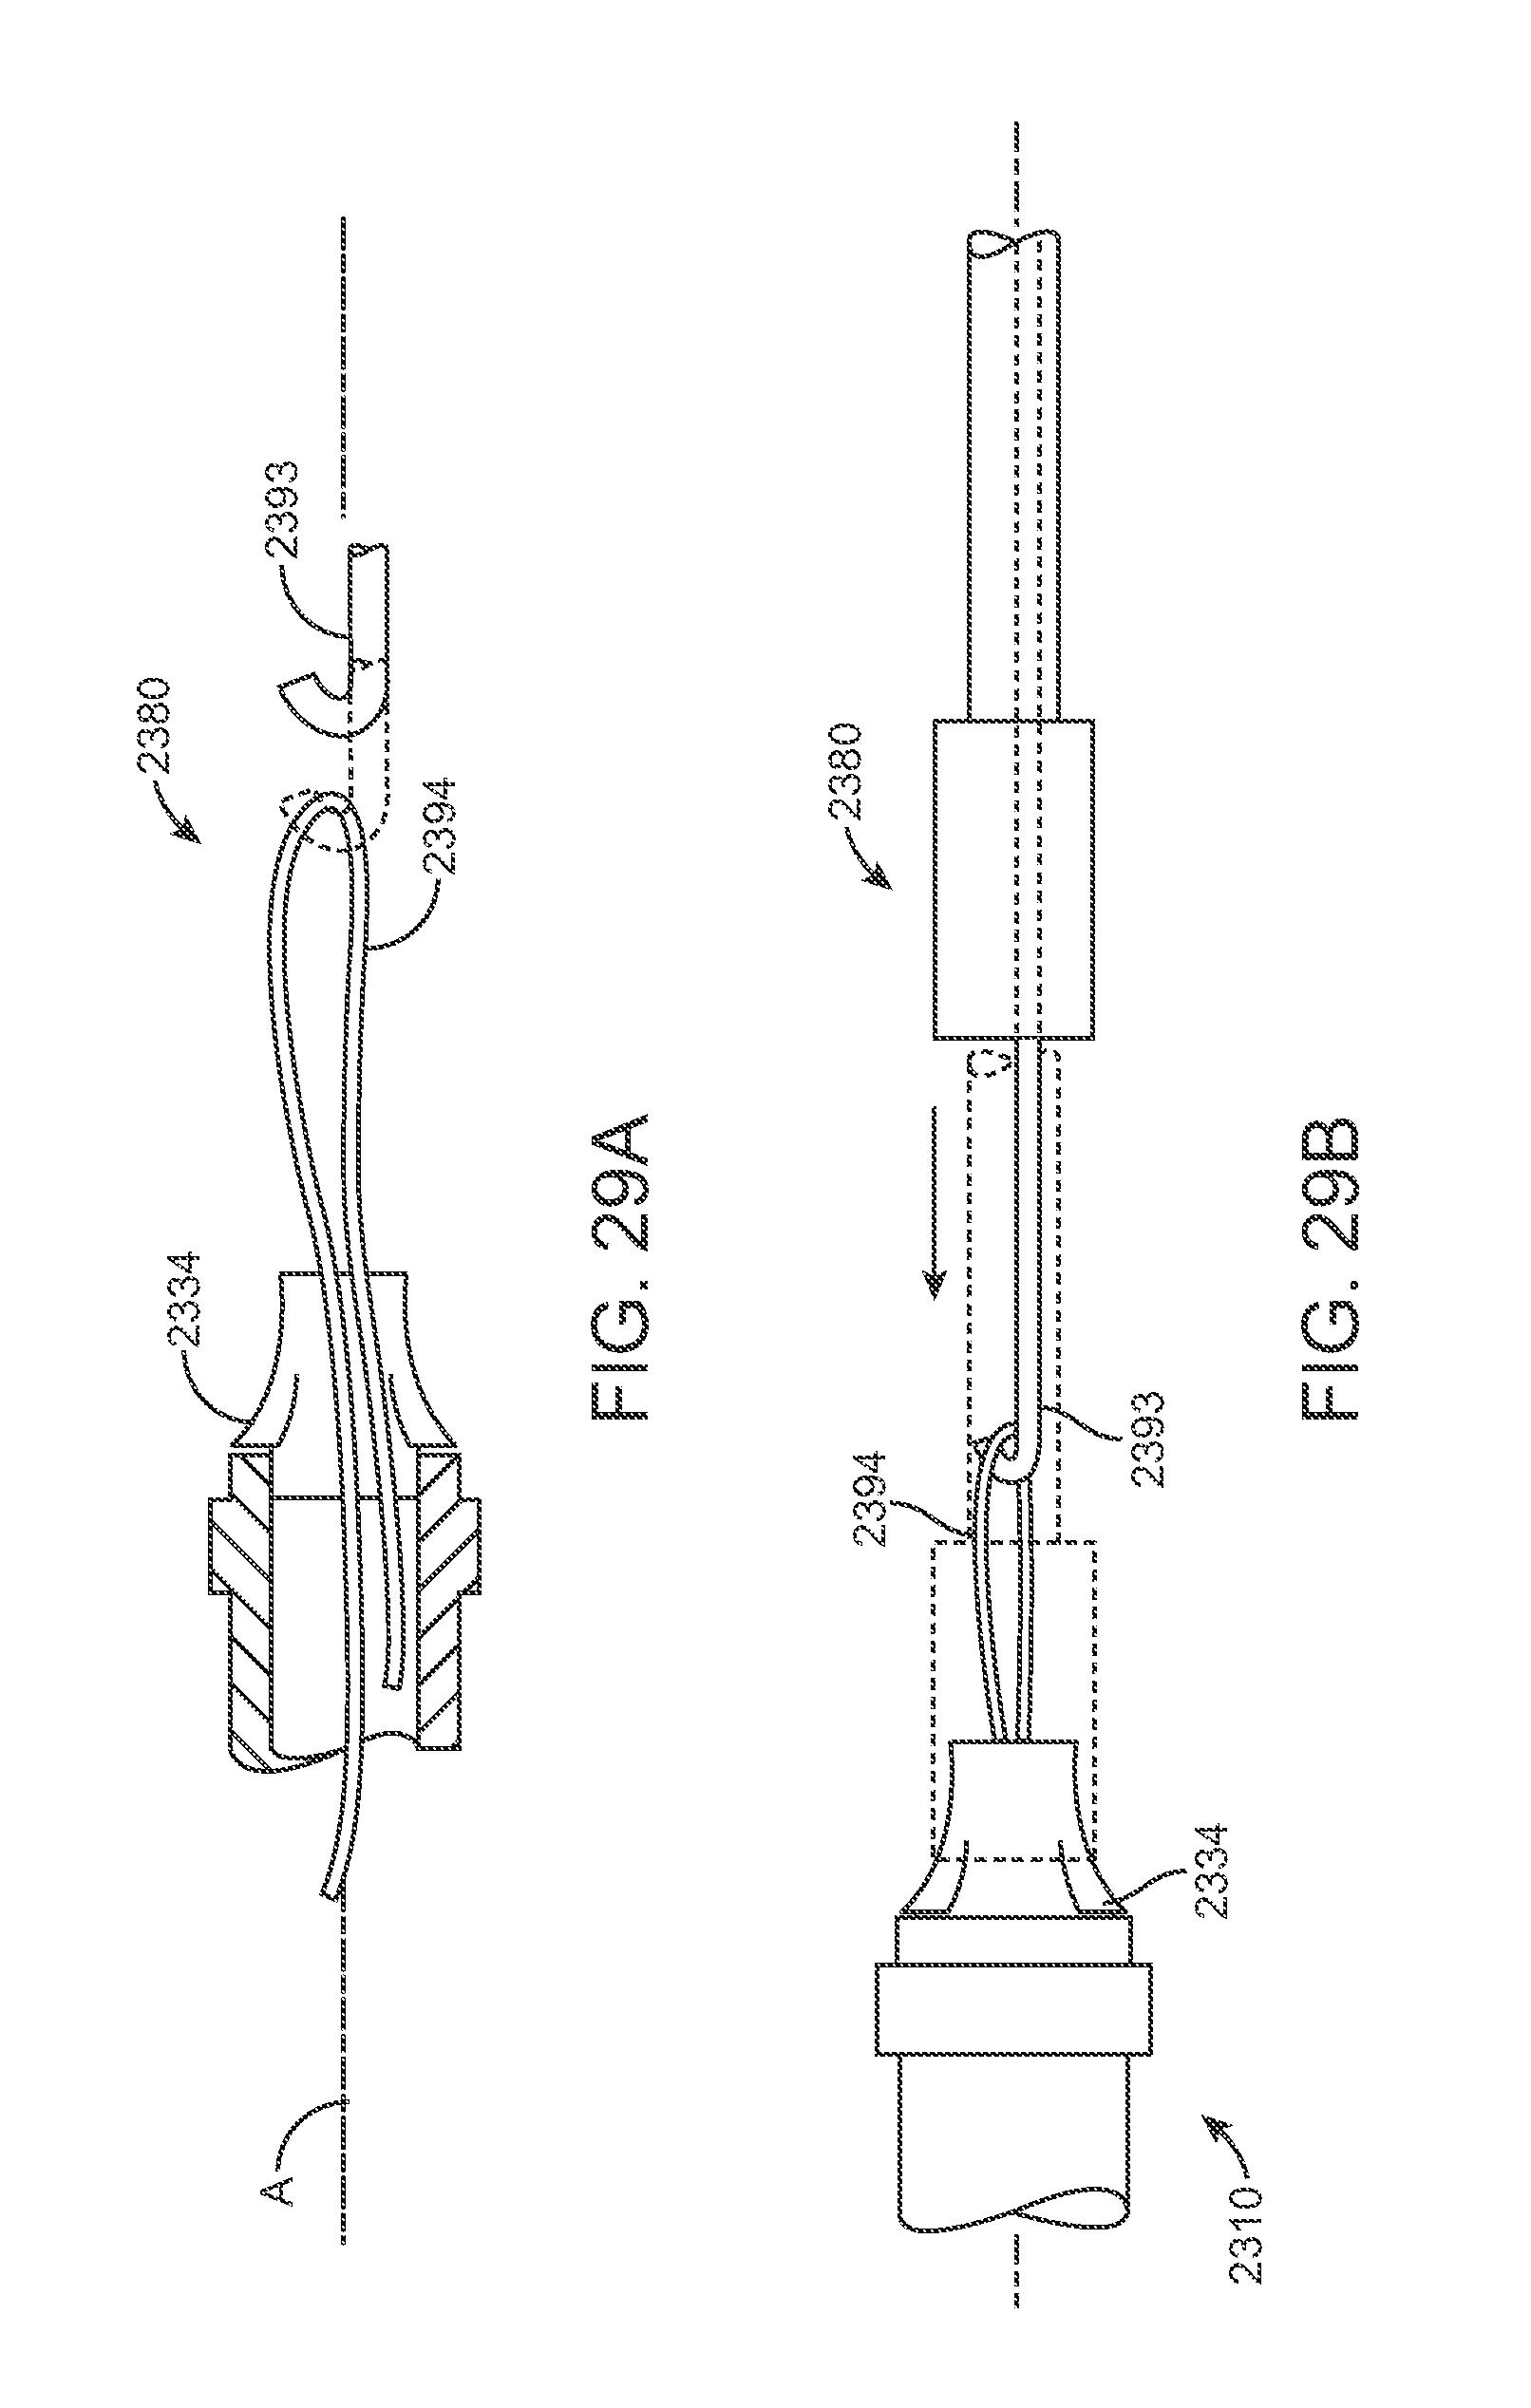 Patent Us 9402632 B2 Auto Rod Controls 3701 Wiring Diagram Images